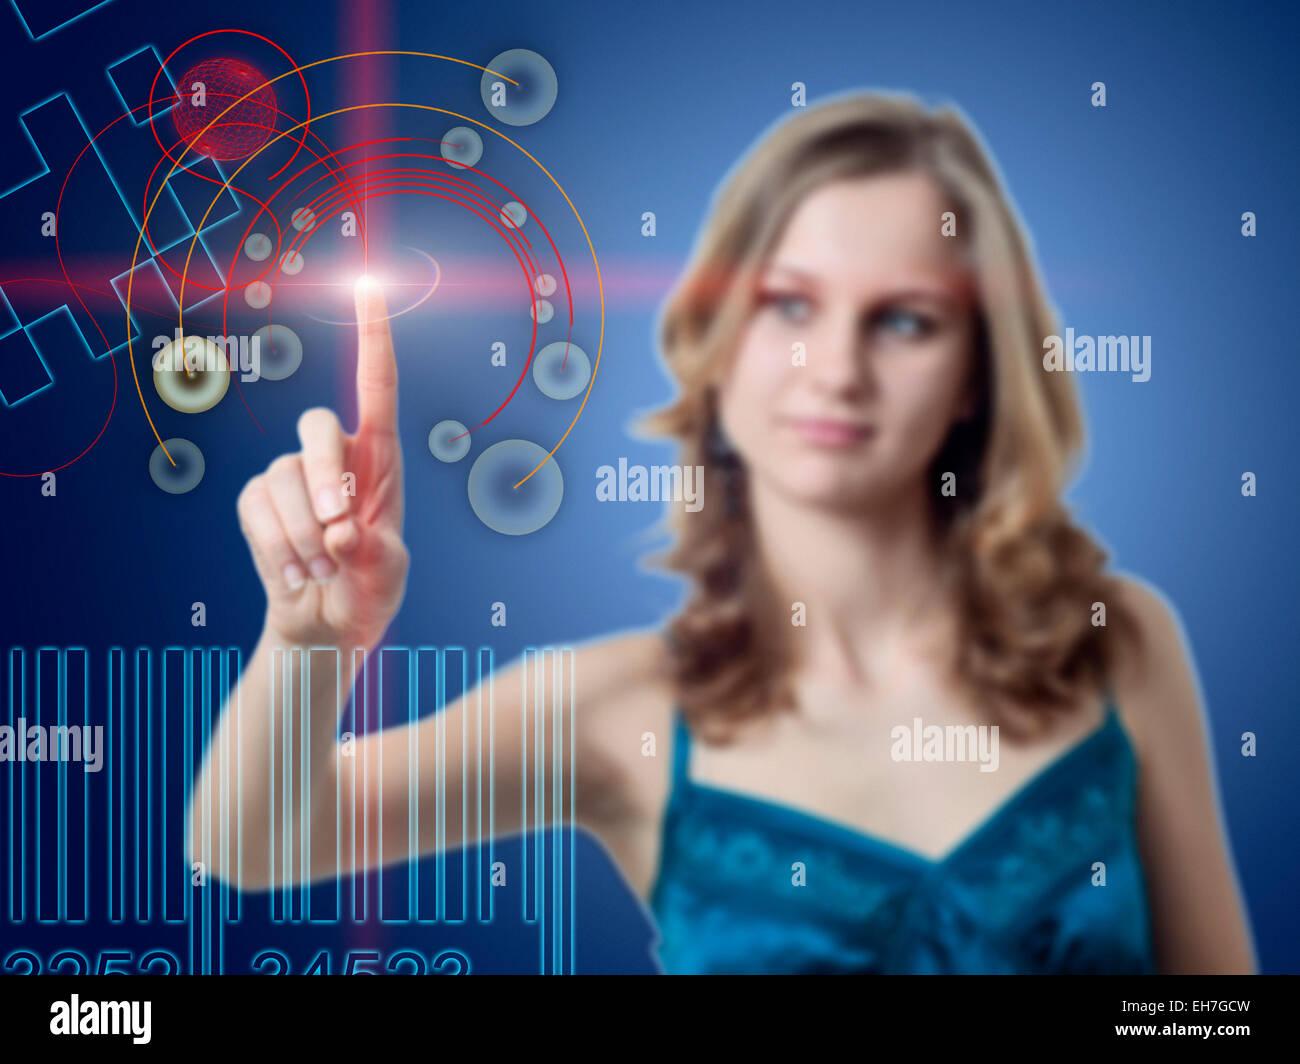 Woman using touchscreen technology - Stock Image